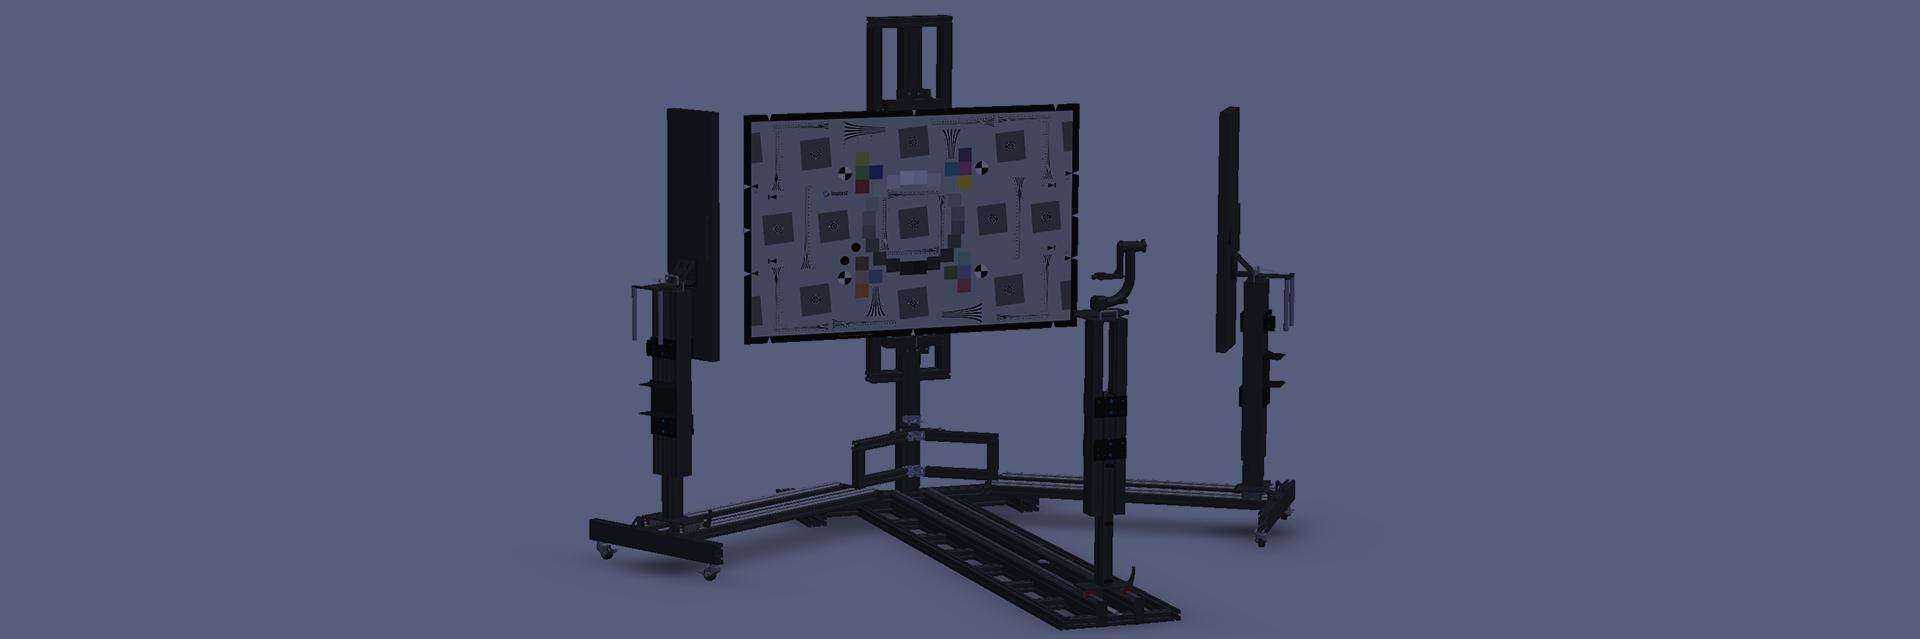 Imatest Modular Test Stand and Reflective Module